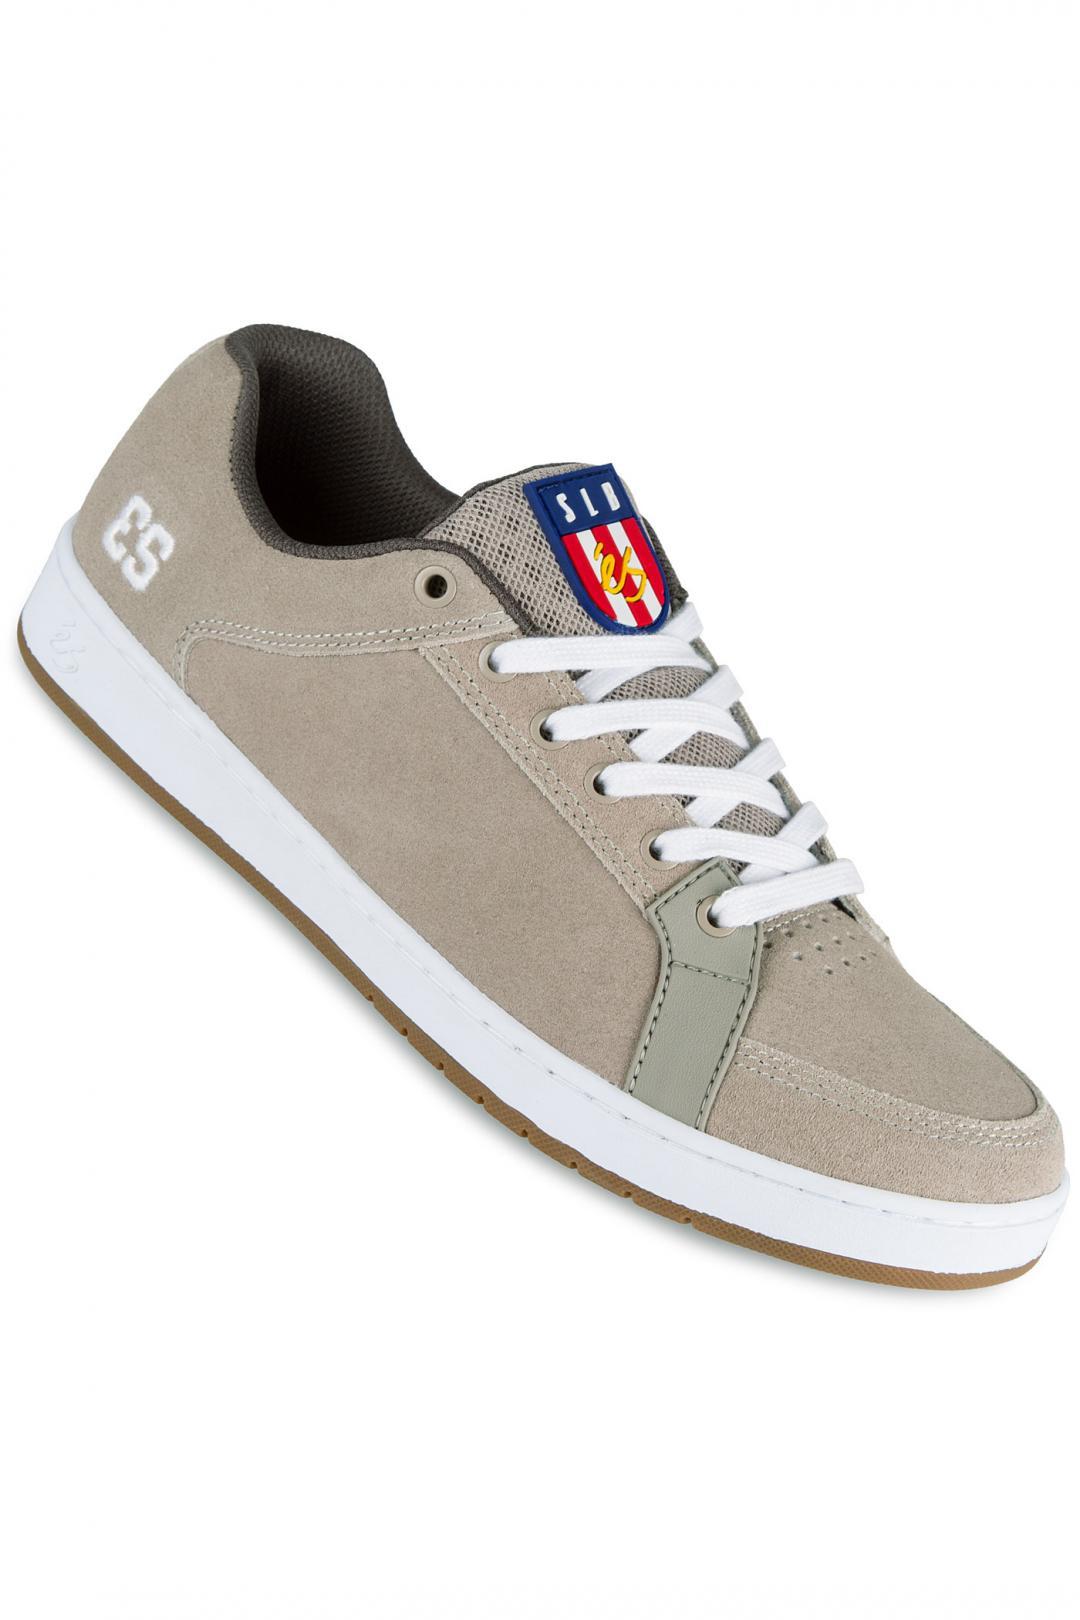 Uomo éS Sal Suede tan | Sneakers low top